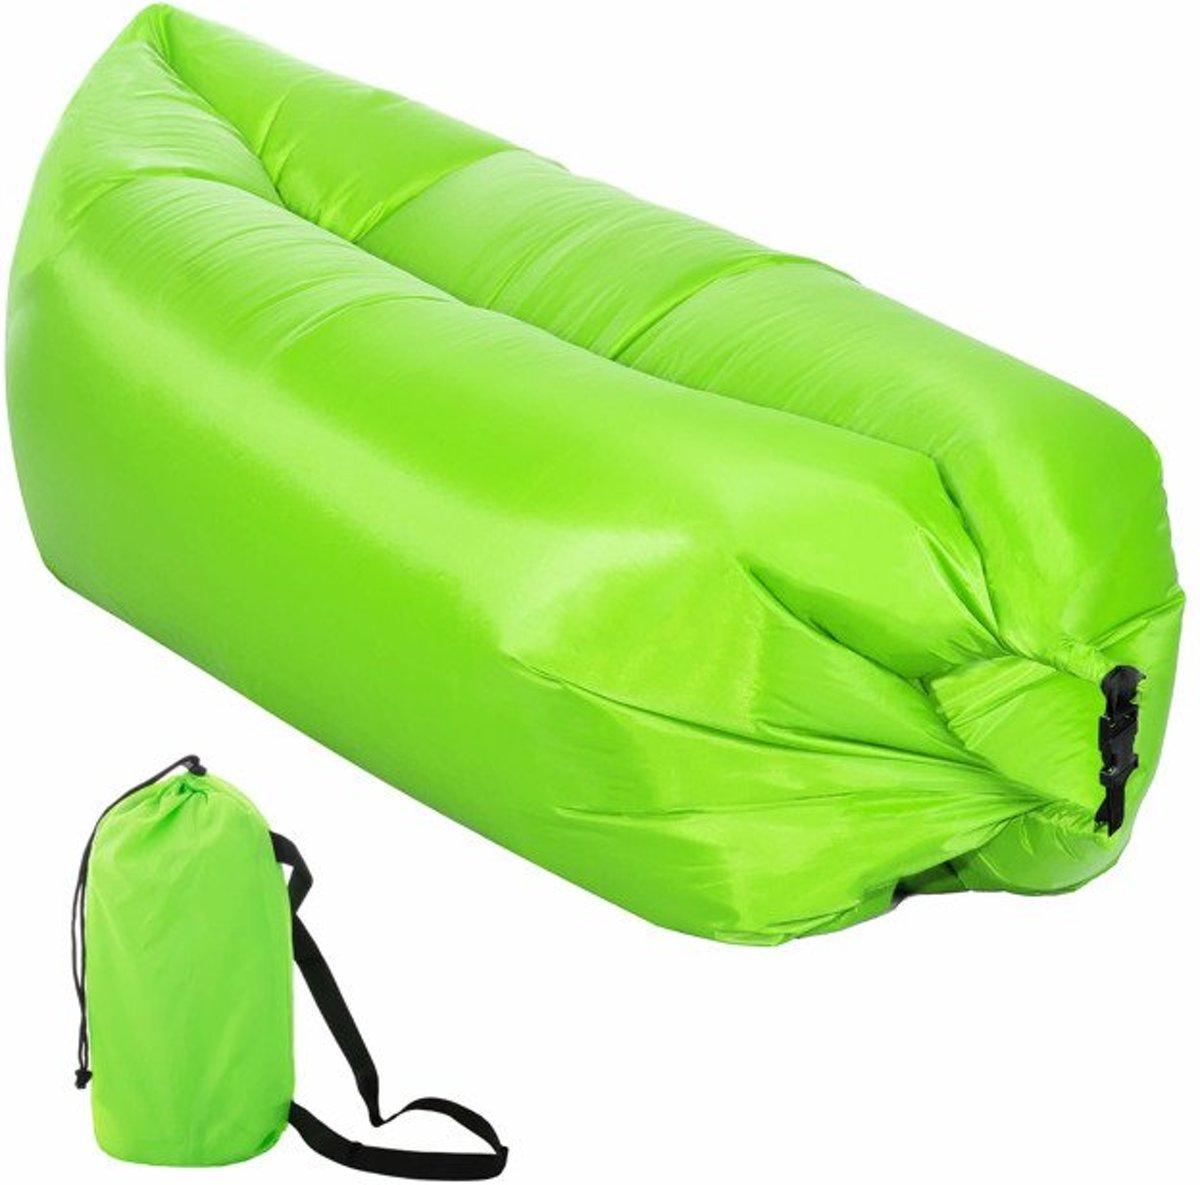 Zitzak Met Lucht.Lazy Bag Groen Xl 190 X 85 Cm Tot 180 Kg Lucht Zitzak